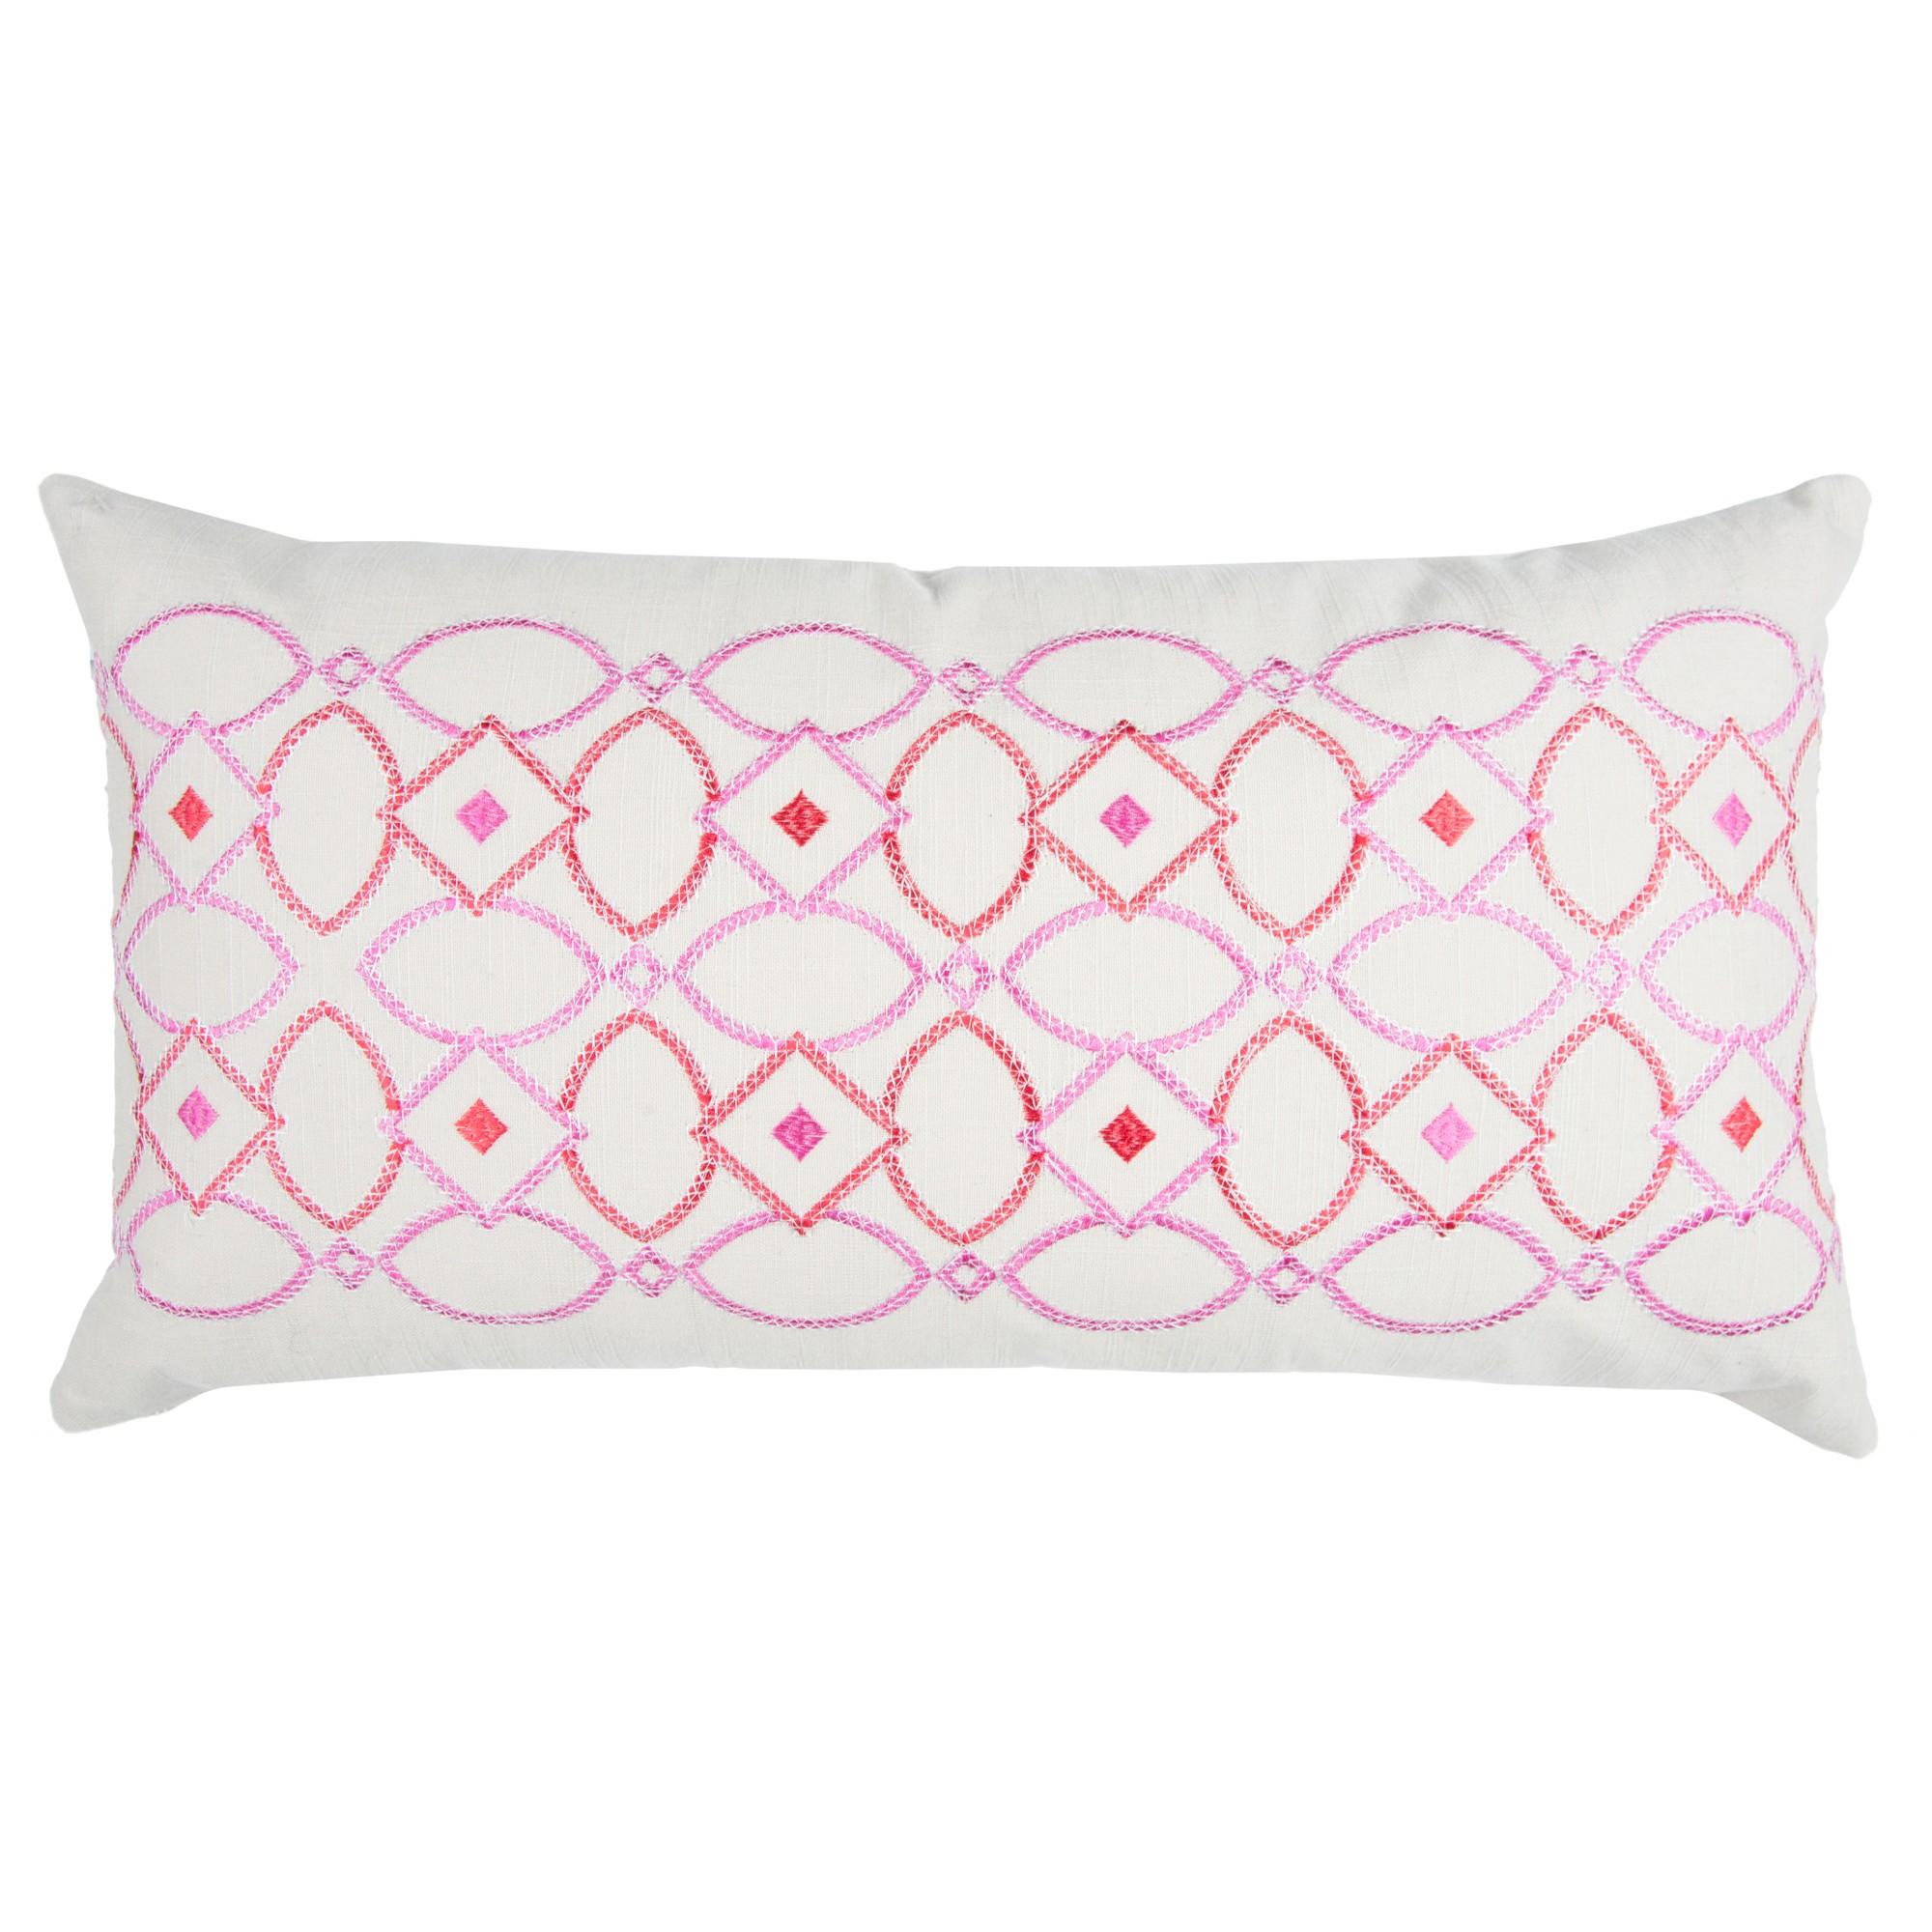 Pink Cotton Throw Pillow (14